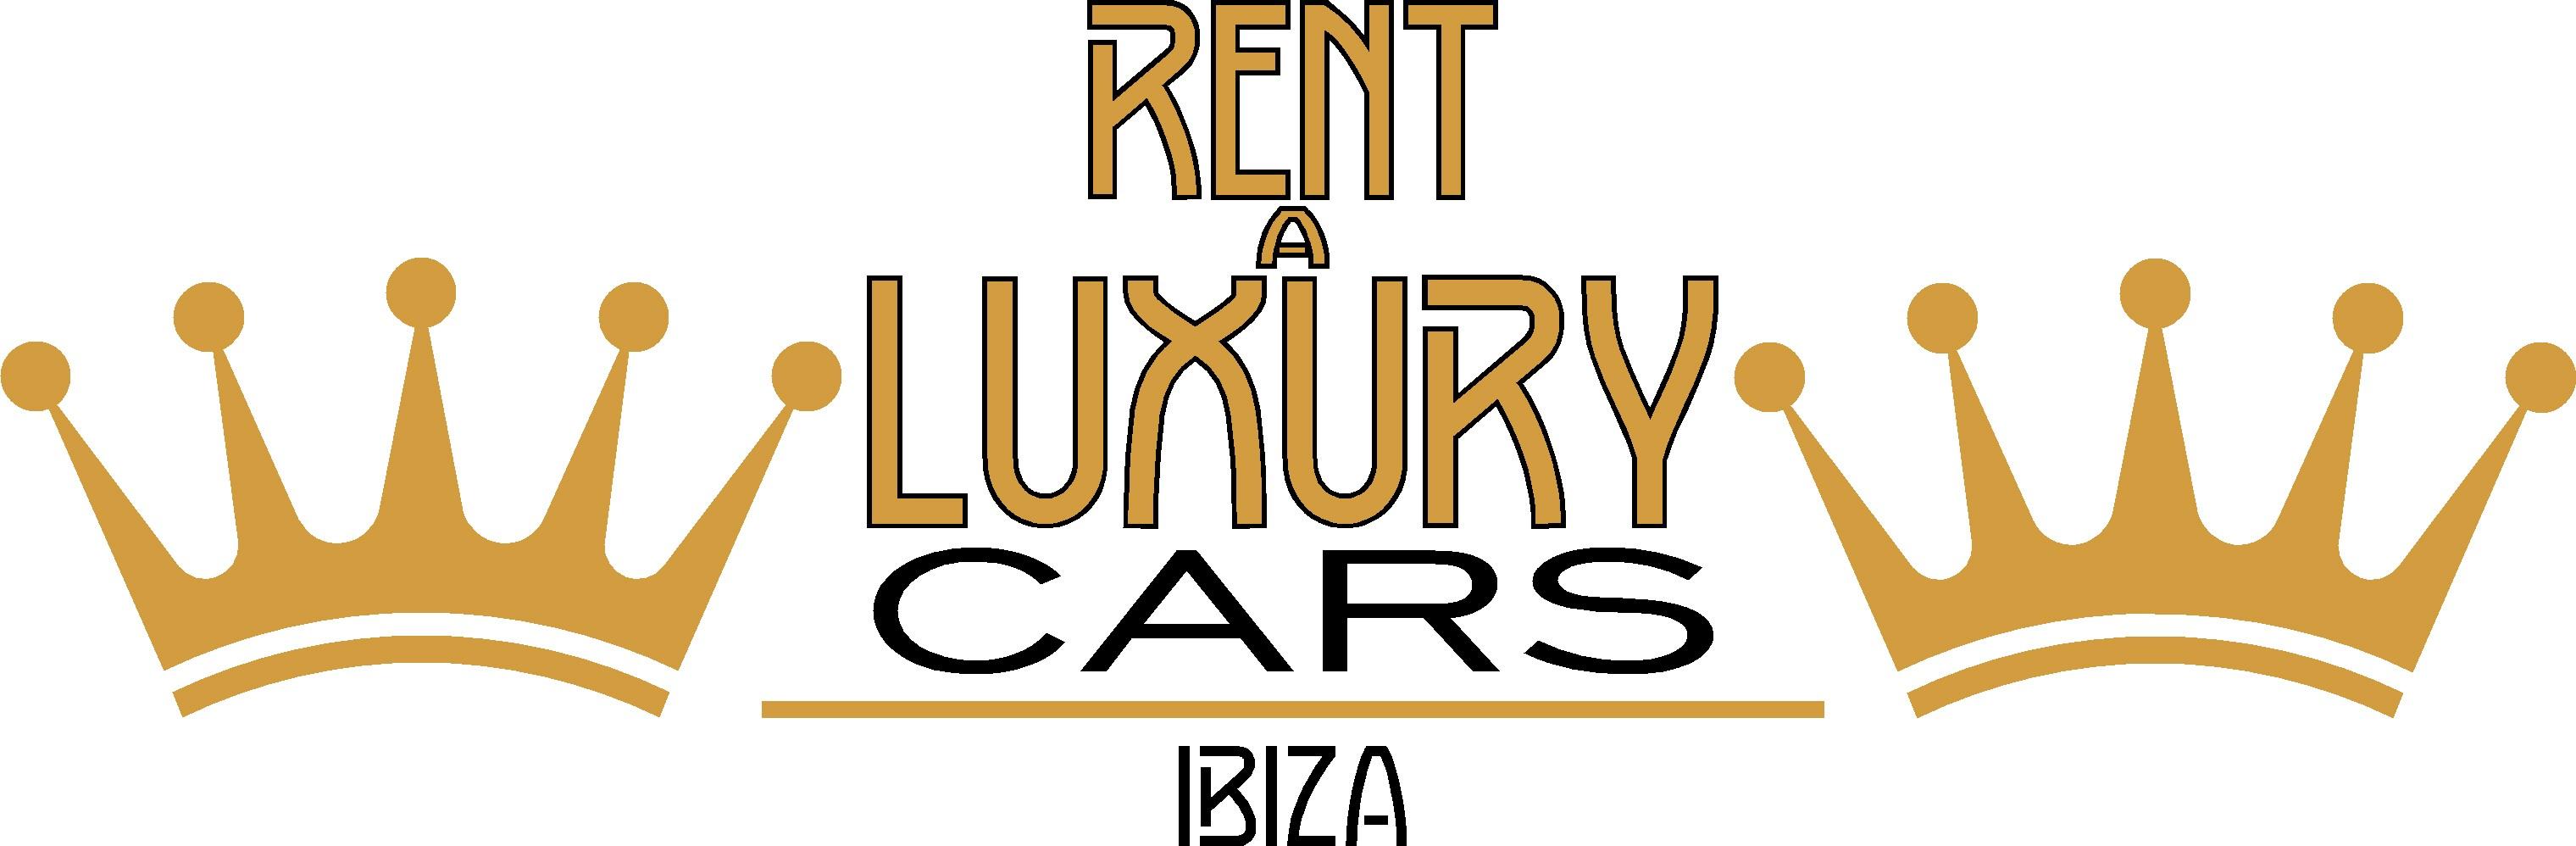 Rent a Luxury Cars Ibiza